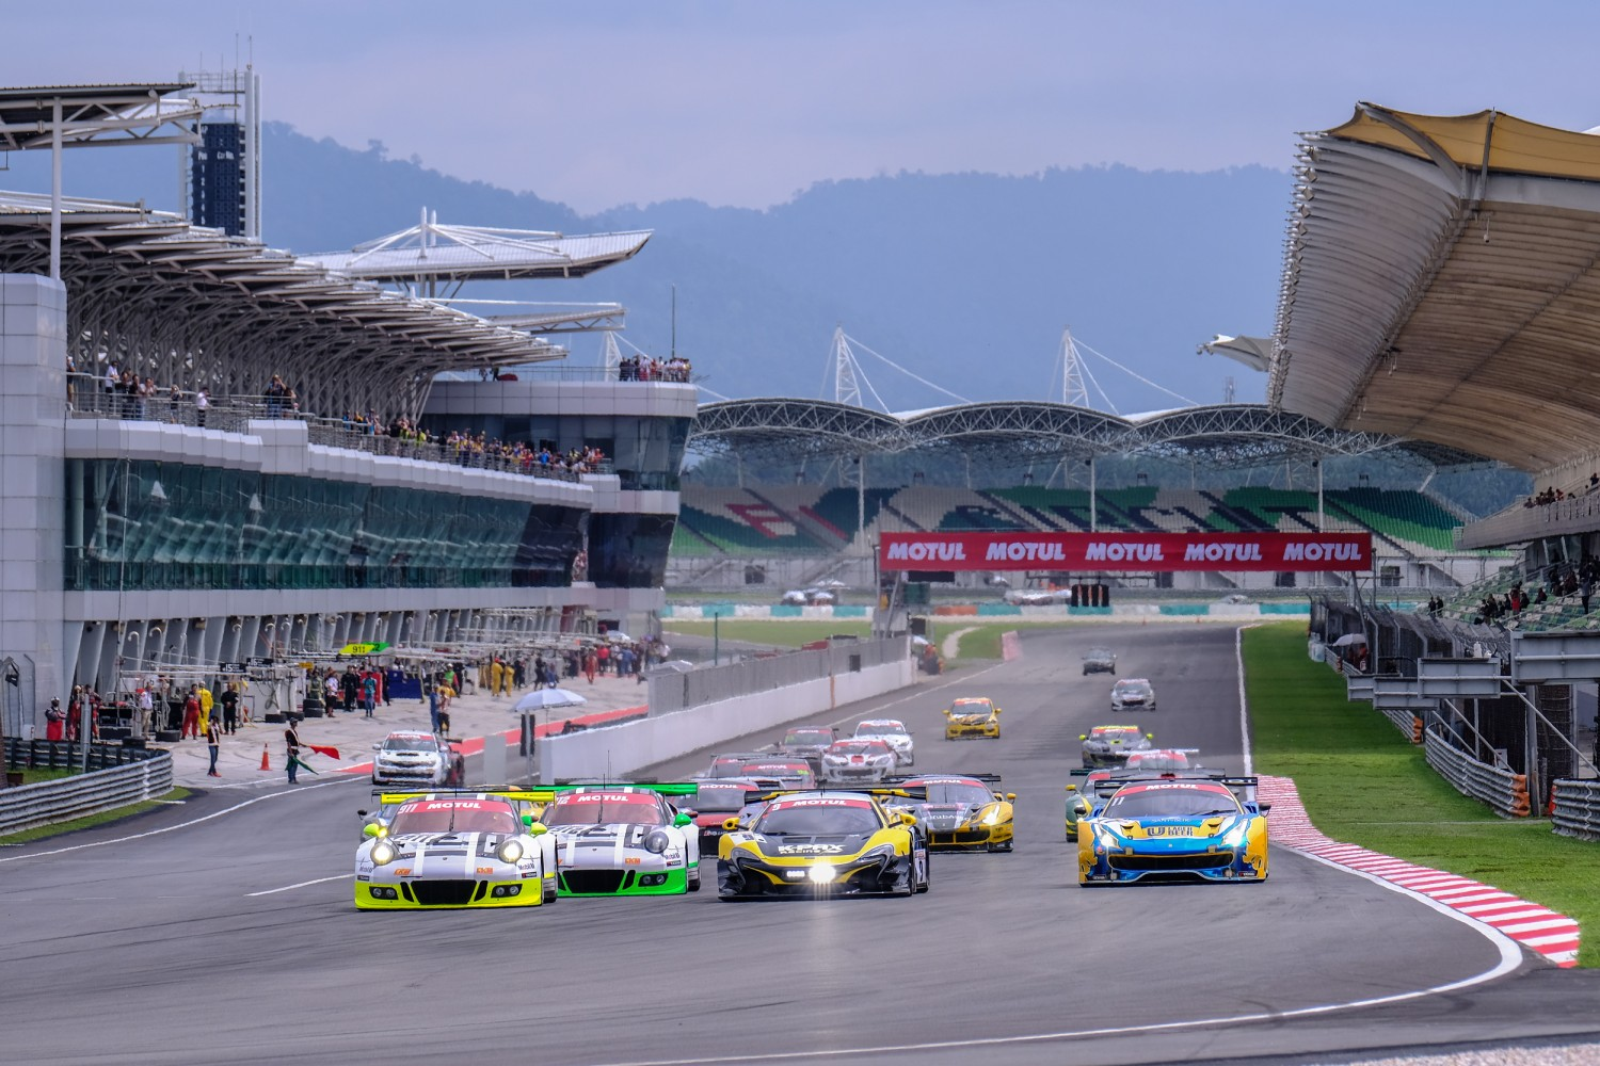 Audi and Laurens Vanthoor win Motul Sepang 12 Hours and inaugural Intercontinental GT Challenge